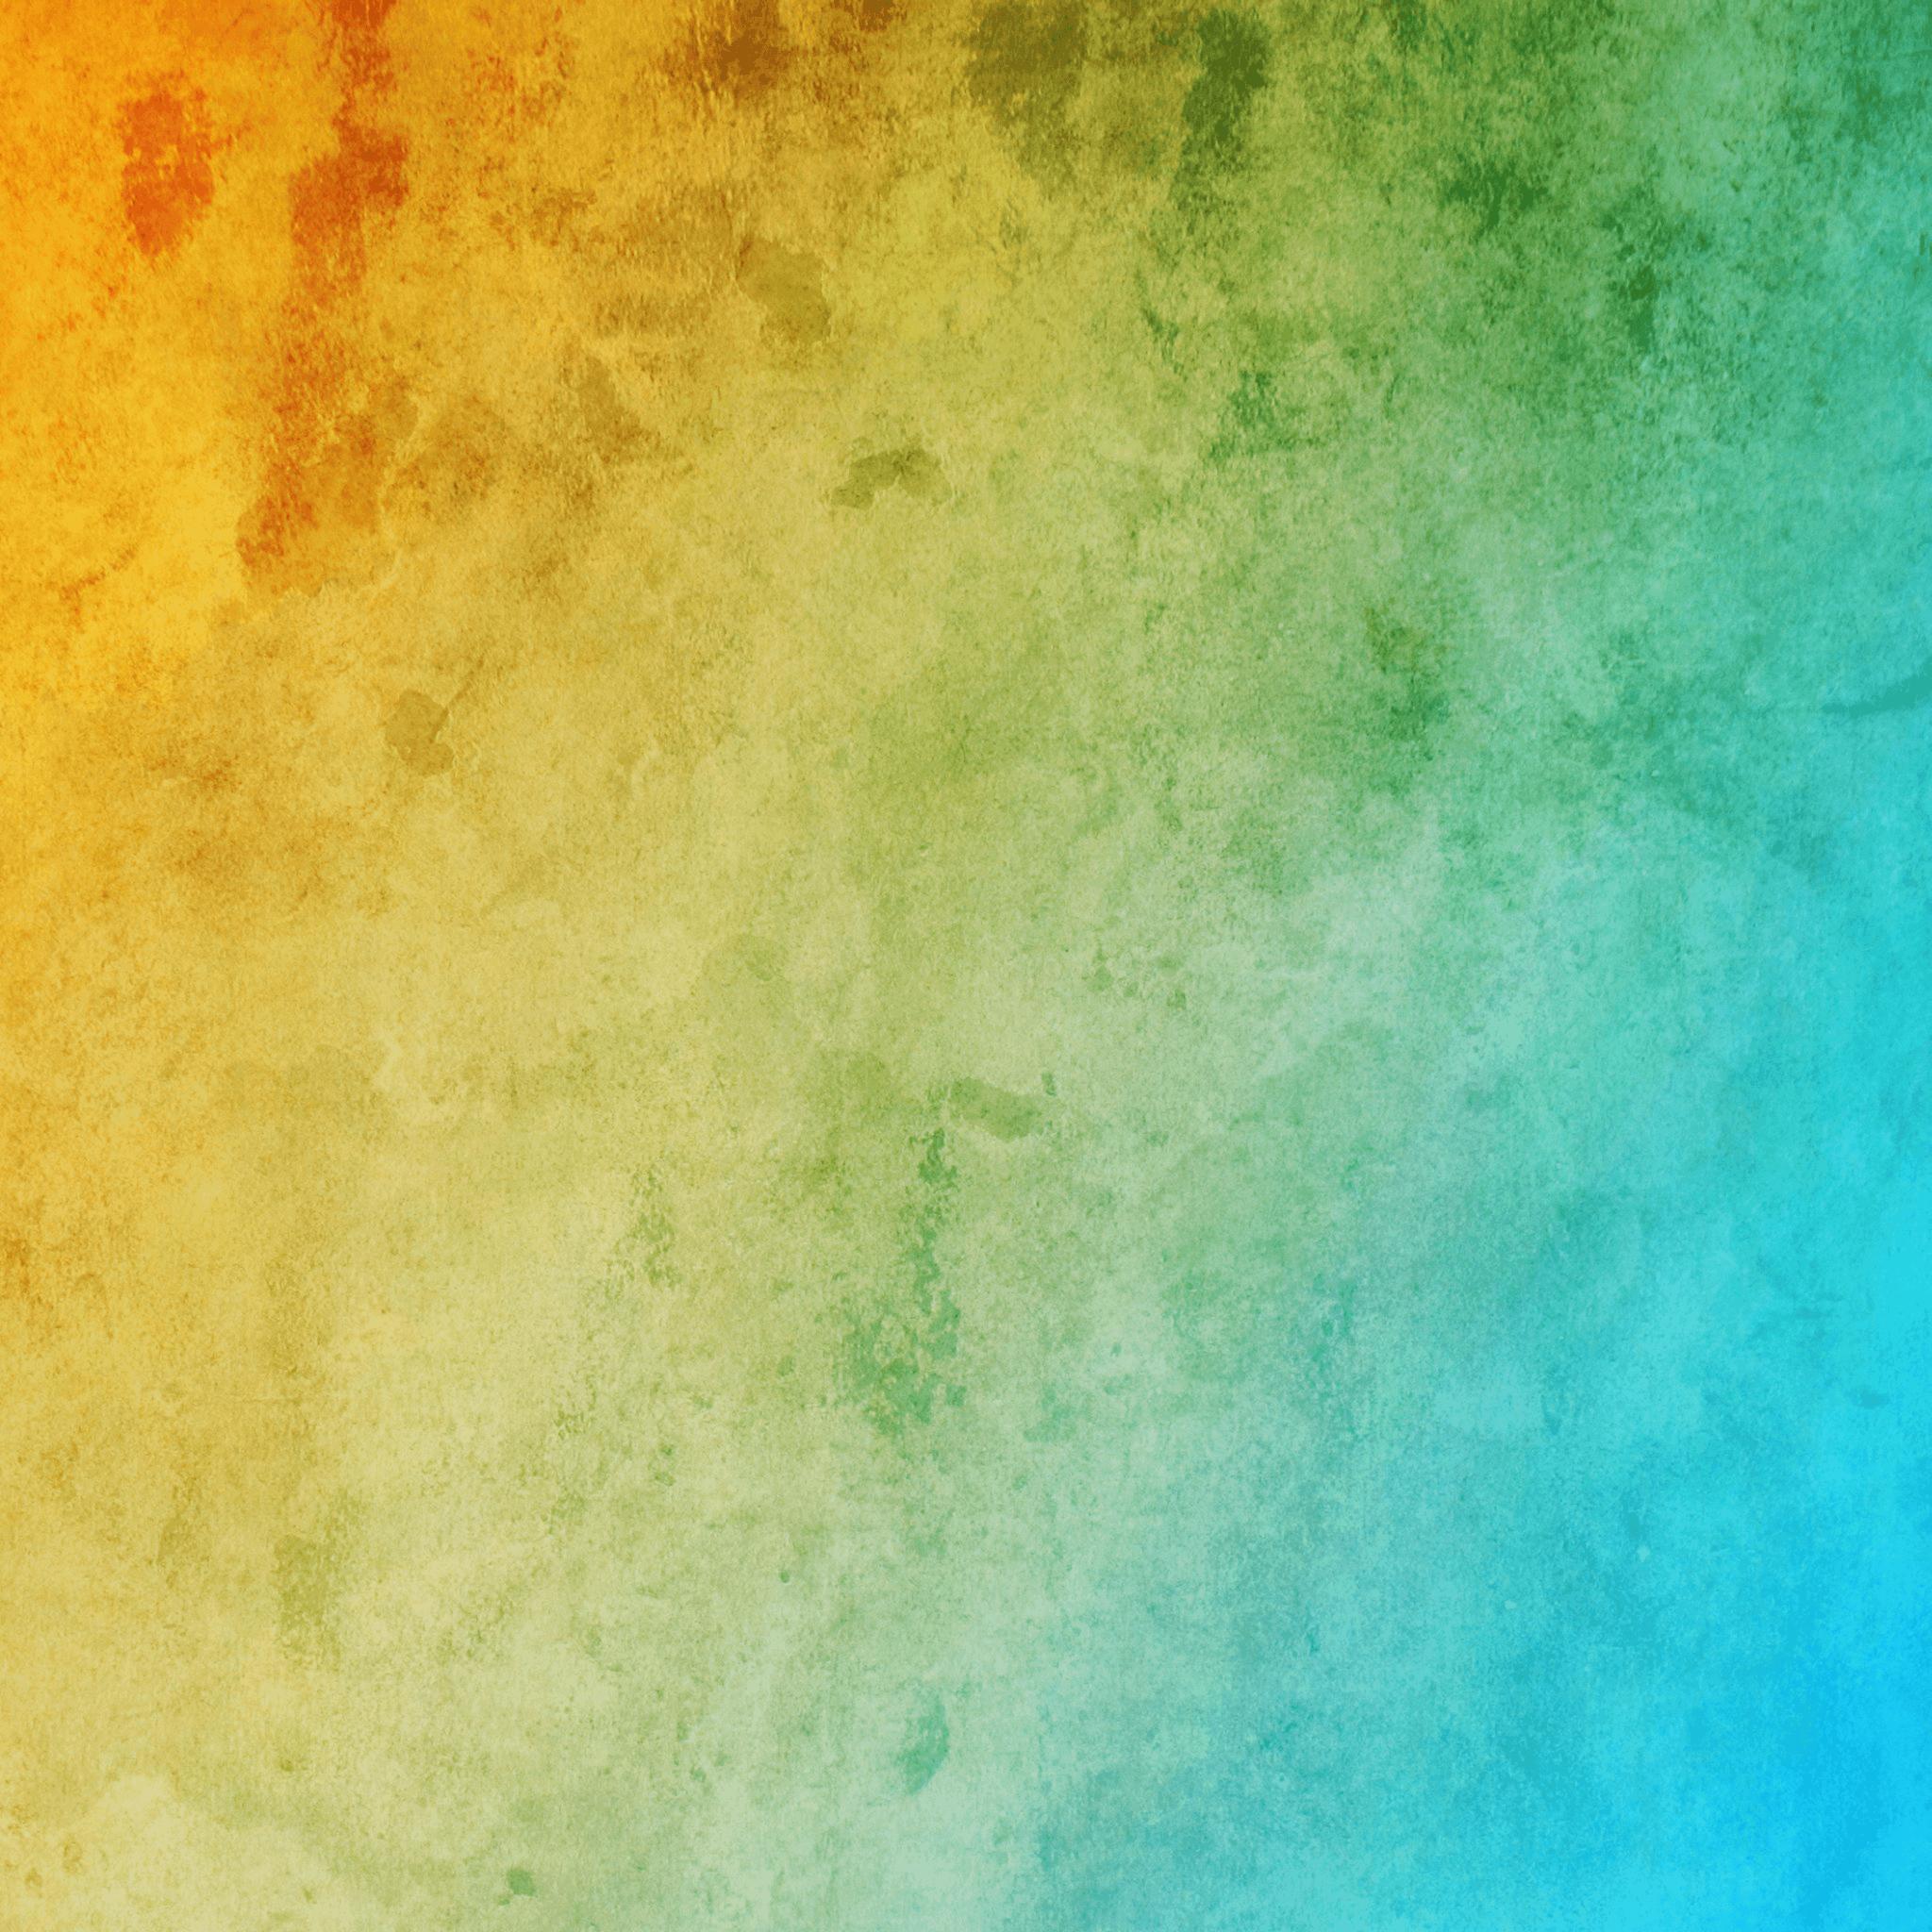 HD Pattern Wallpapers - Top Free HD Pattern Backgrounds